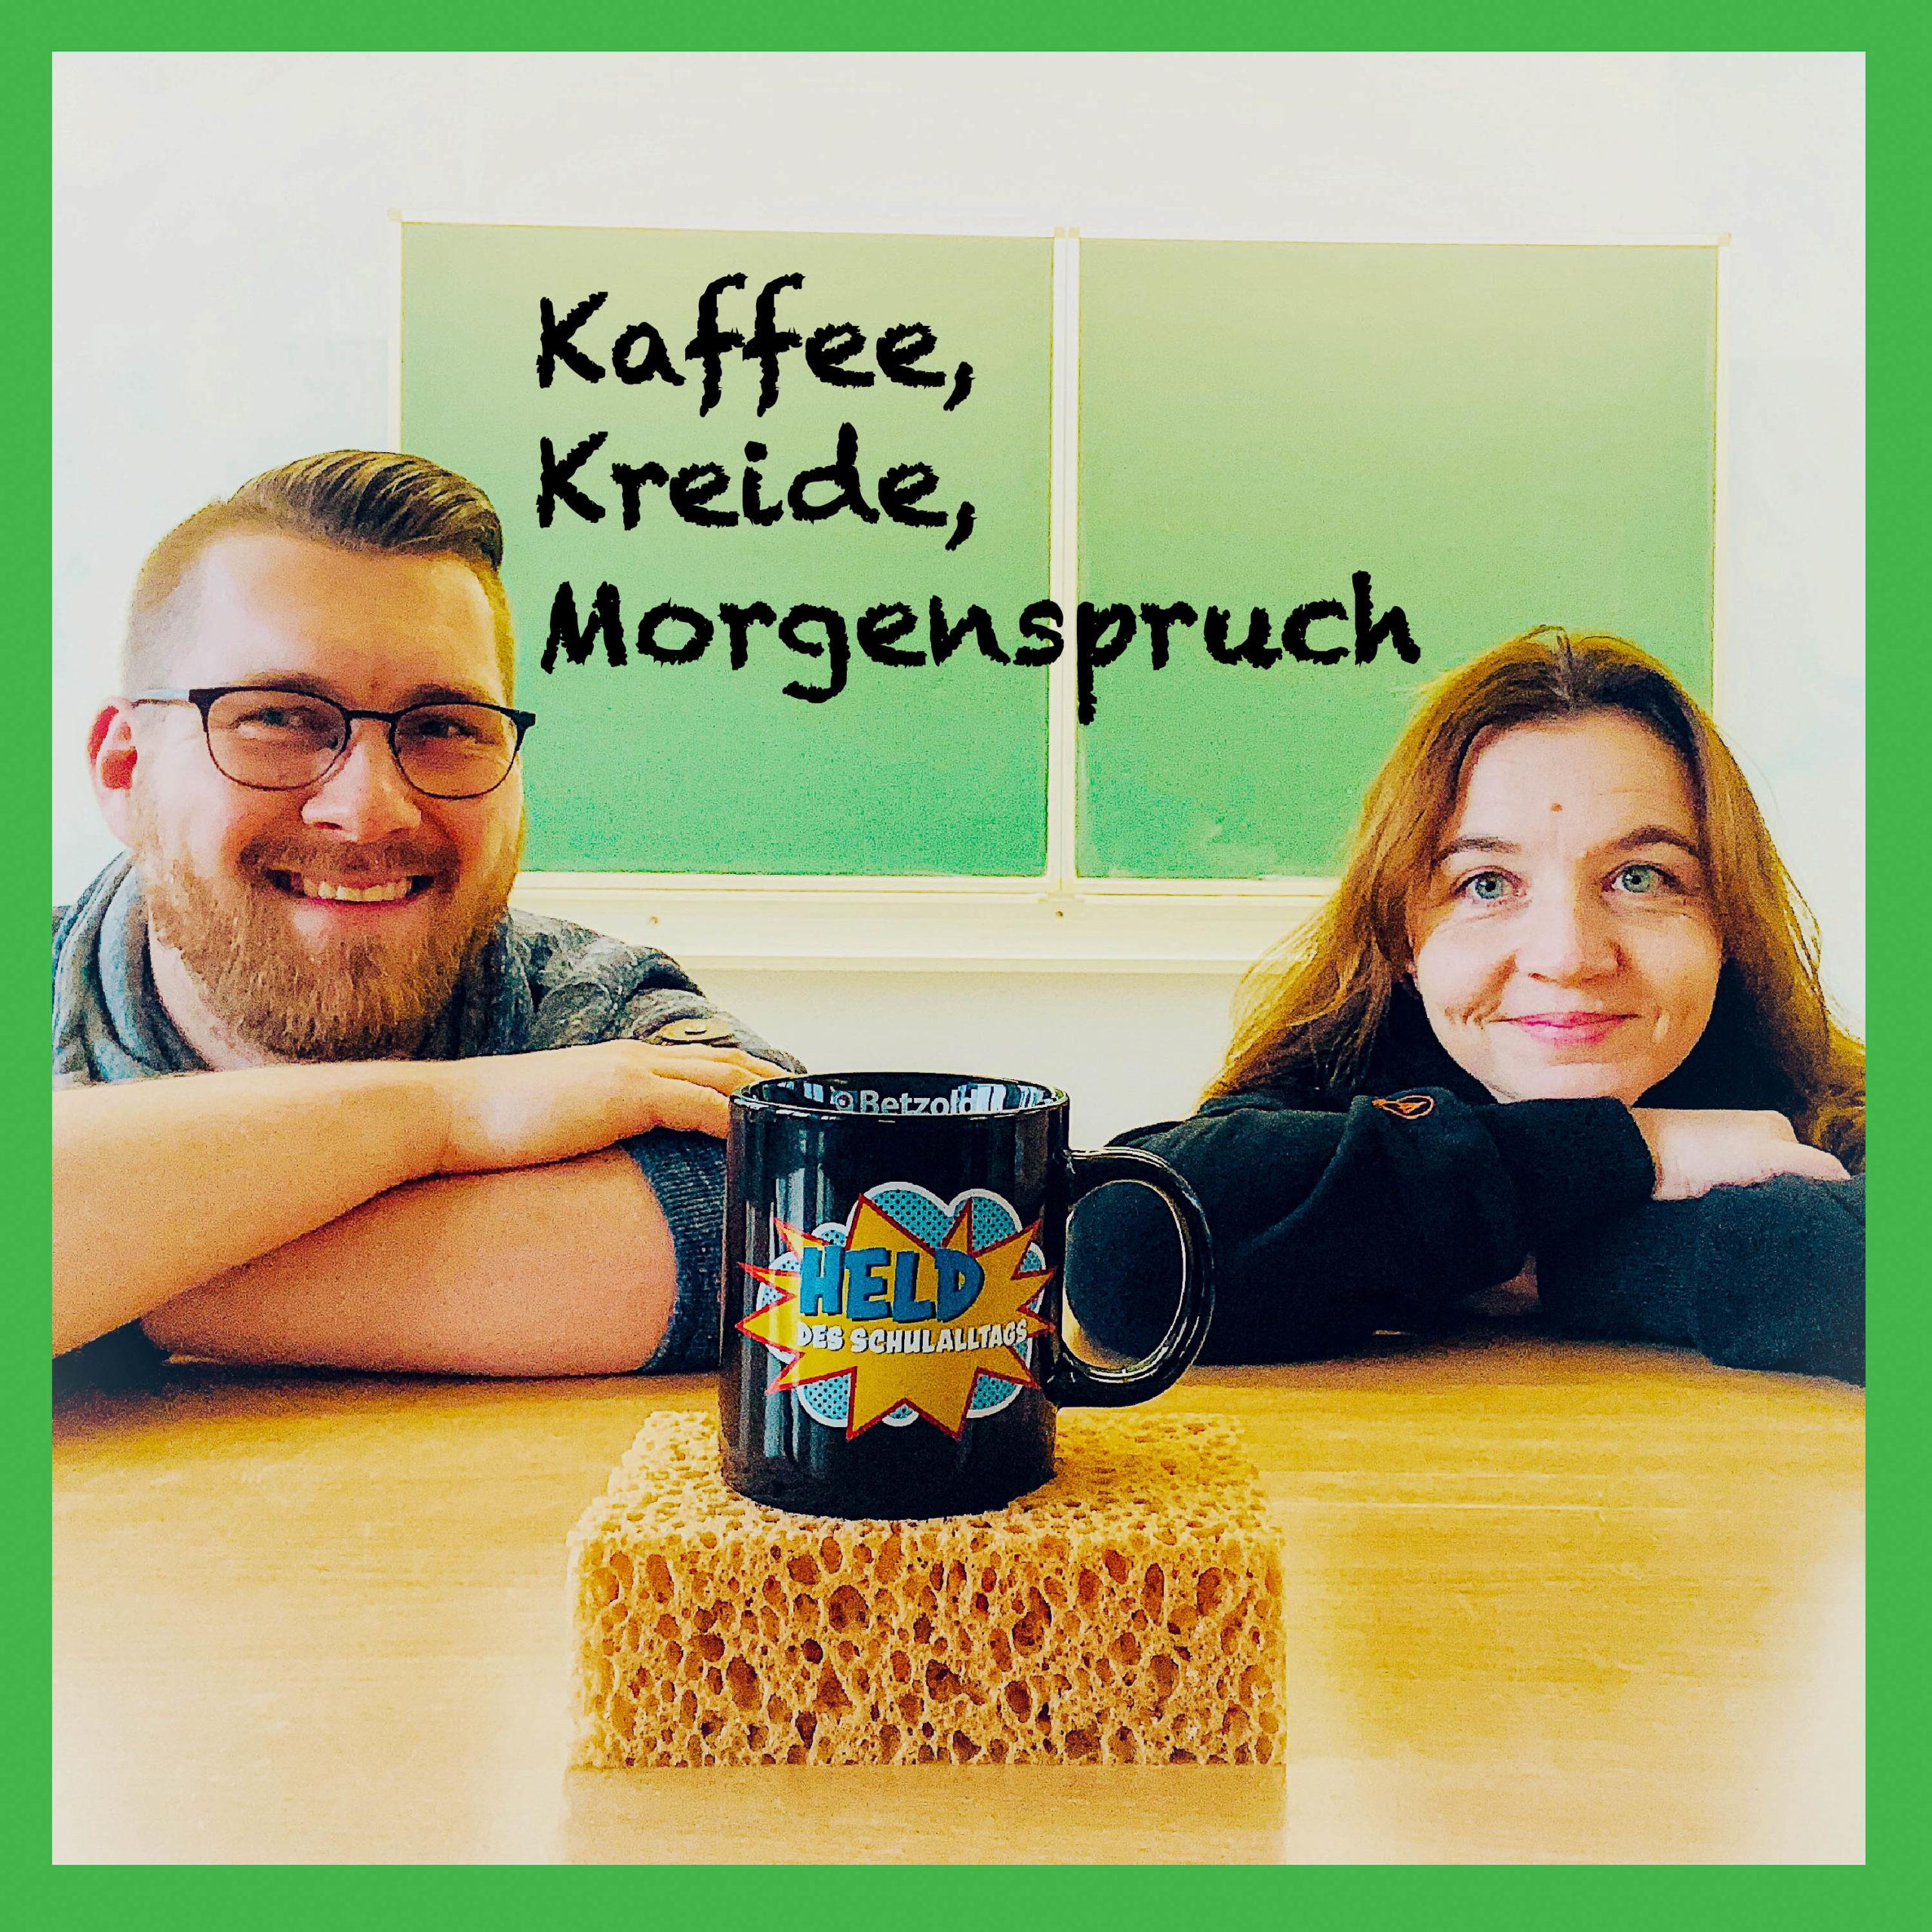 Podcast Kaffee, Kreide, Morgenspruch